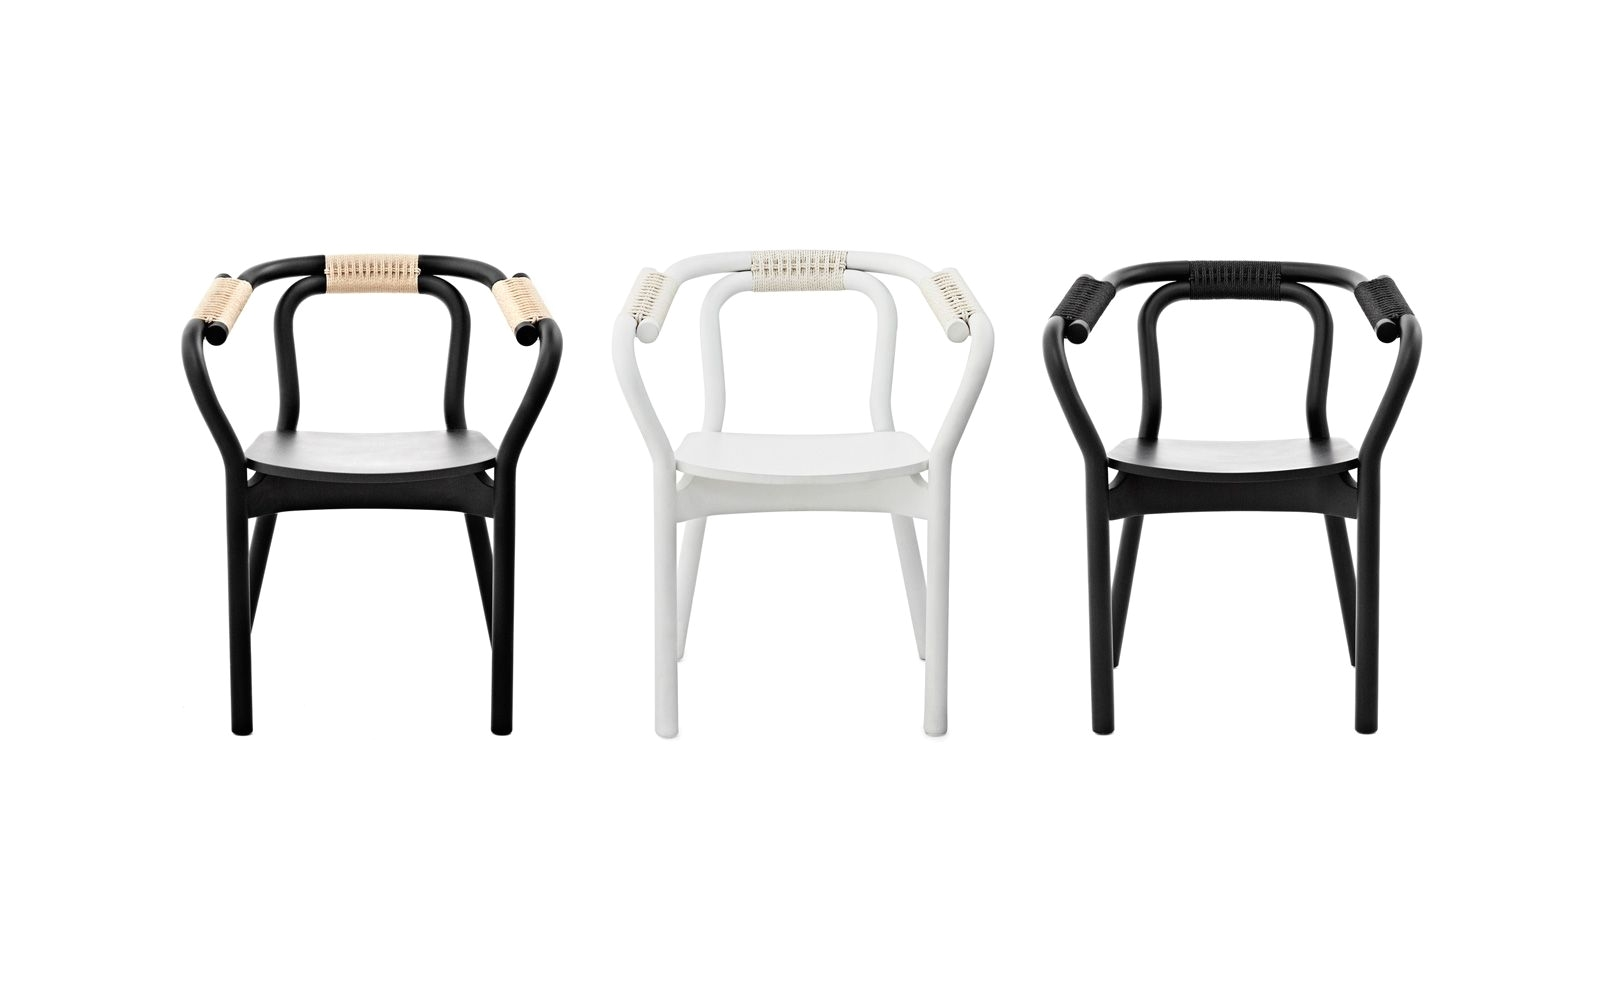 Chair Caning Supplies Ottawa Knot Chairs by normann Copenhagen Furniture Envy Pinterest